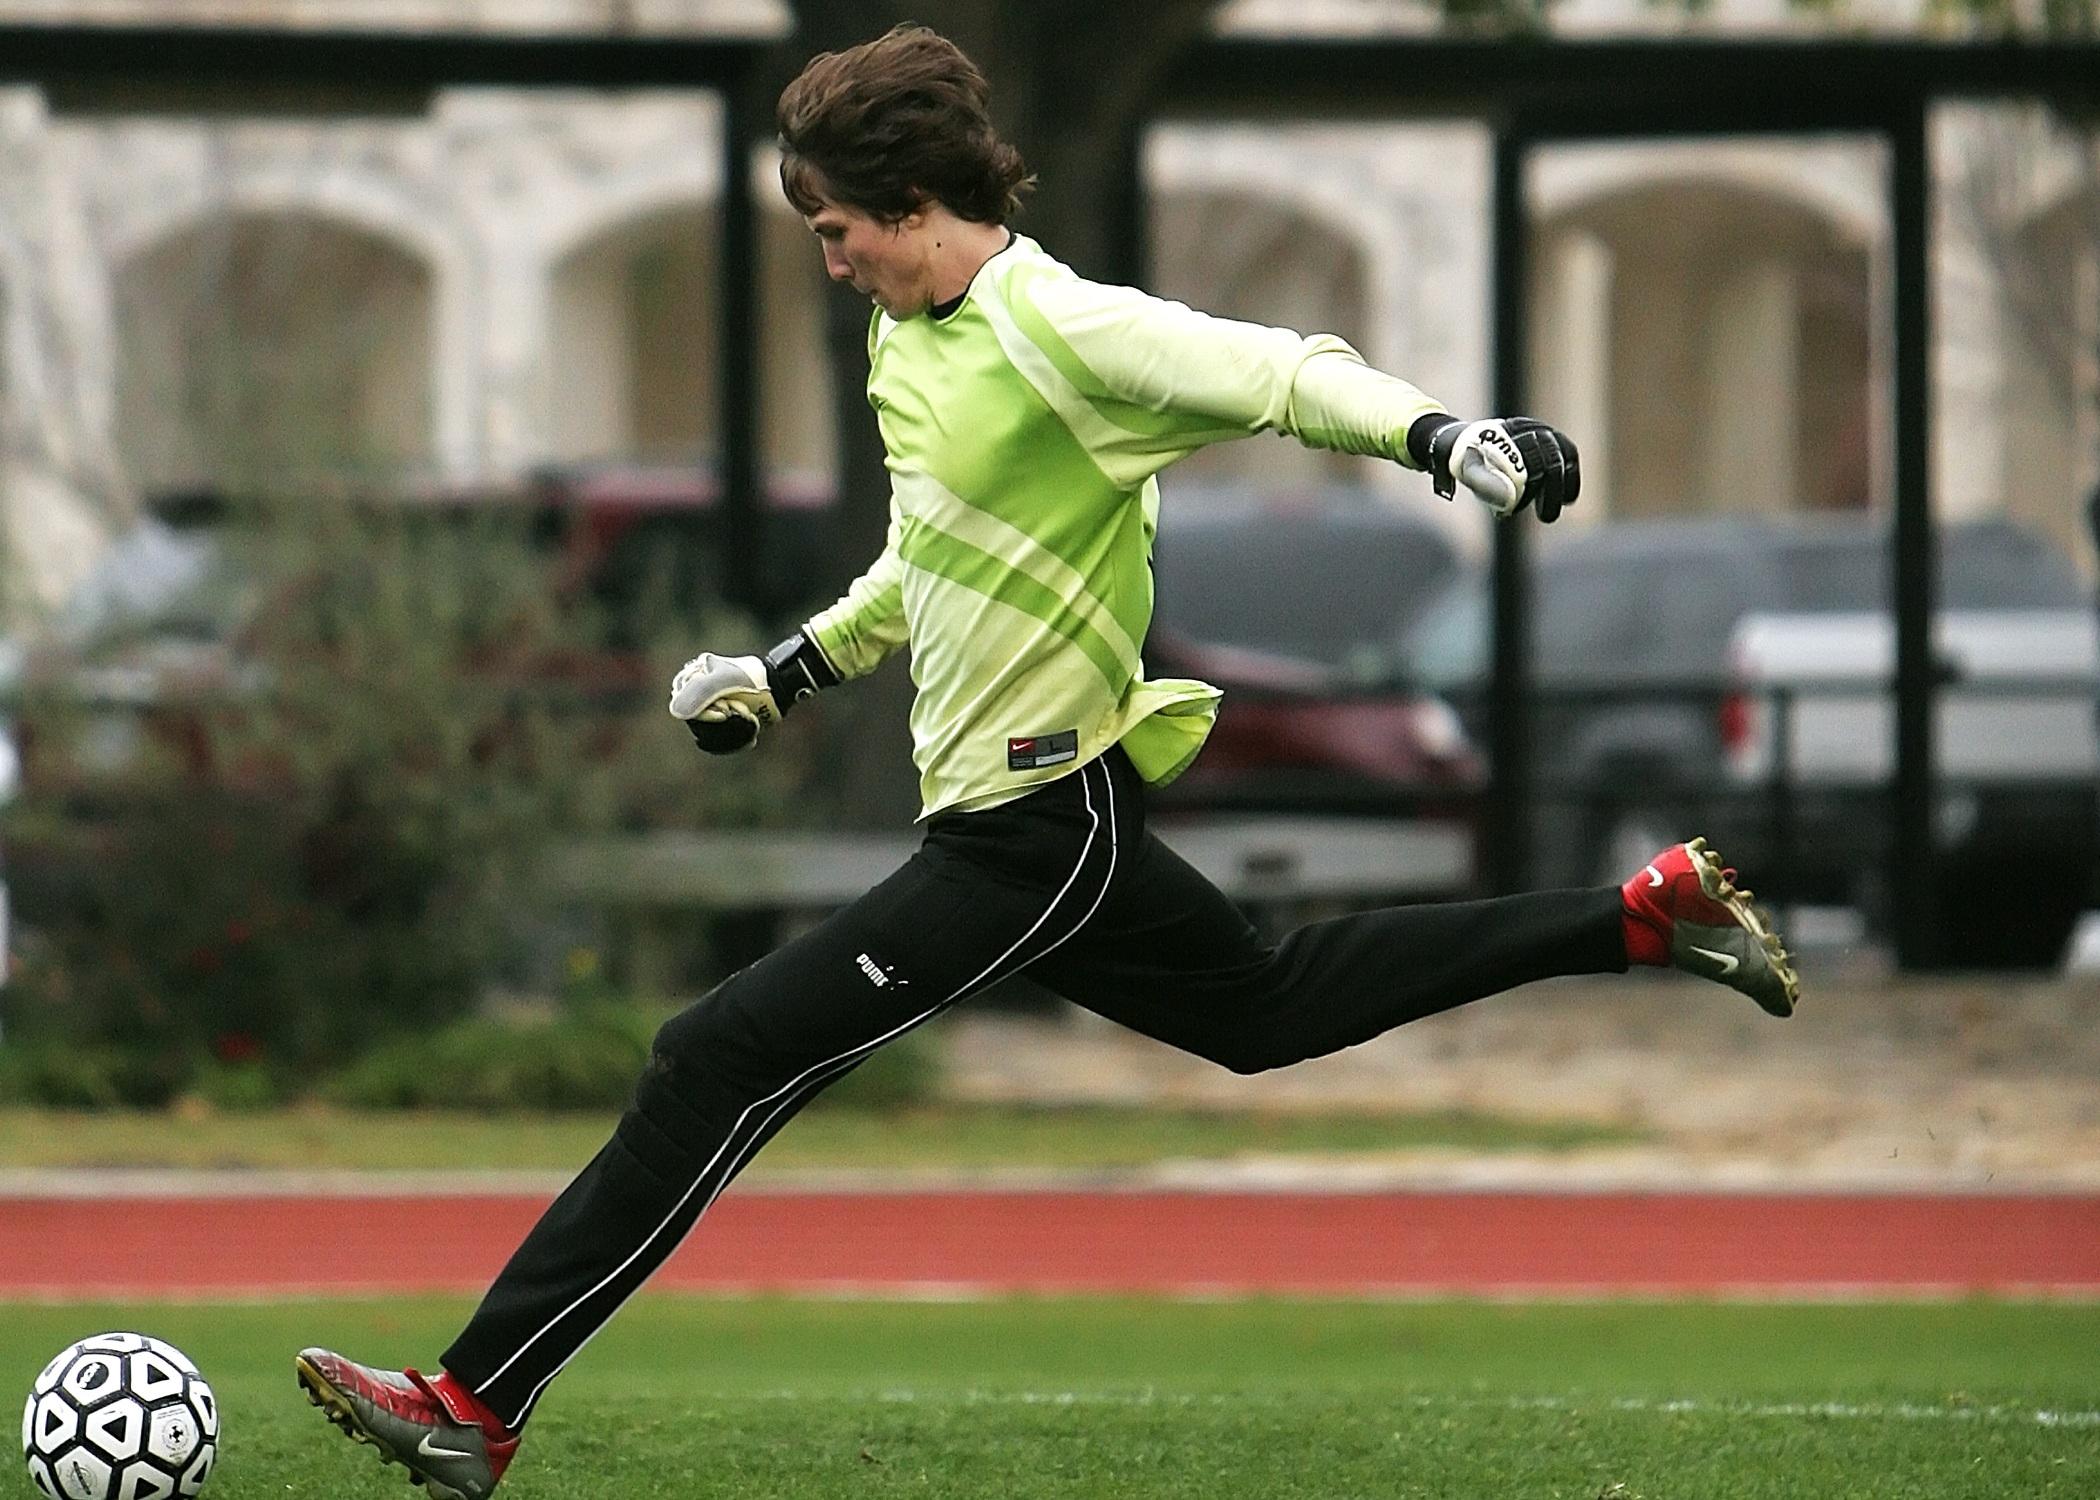 soccer-goal-keeper-player-kick-159516.jpeg